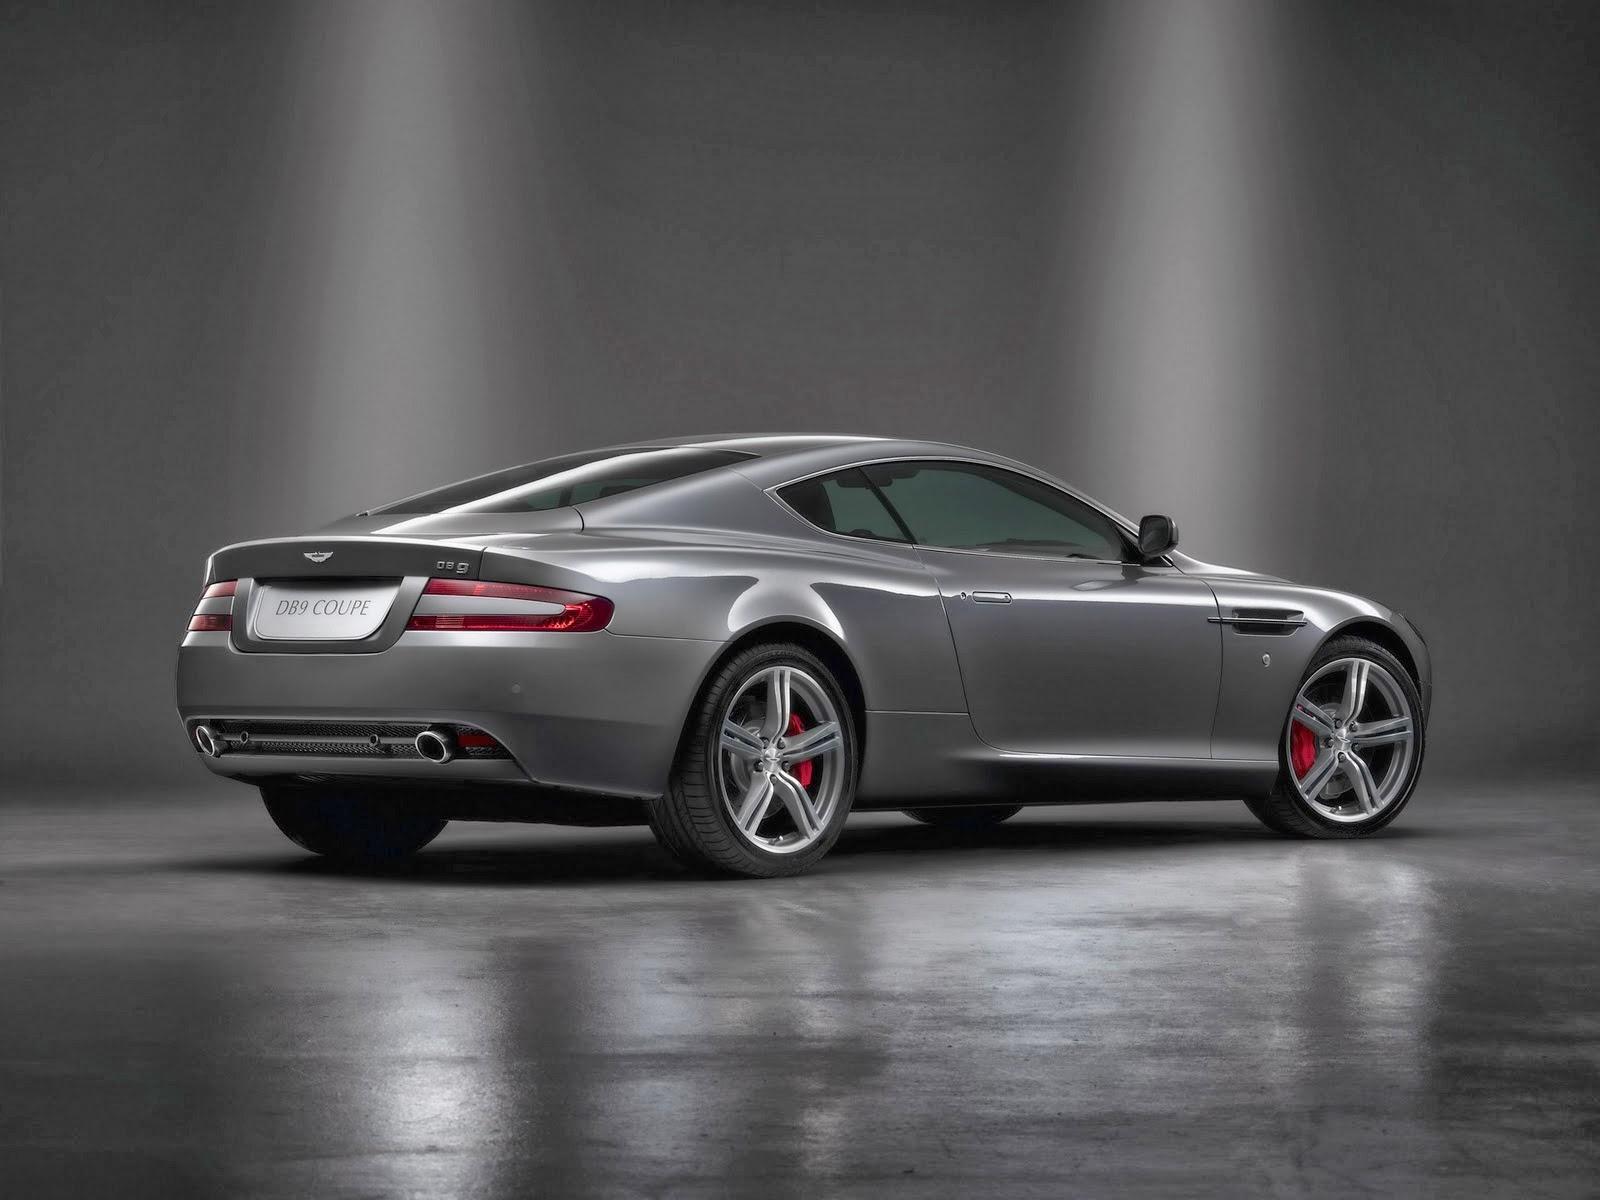 HD Wallpapers-Aston Martin DB9 ~ HD WALLPAPERS